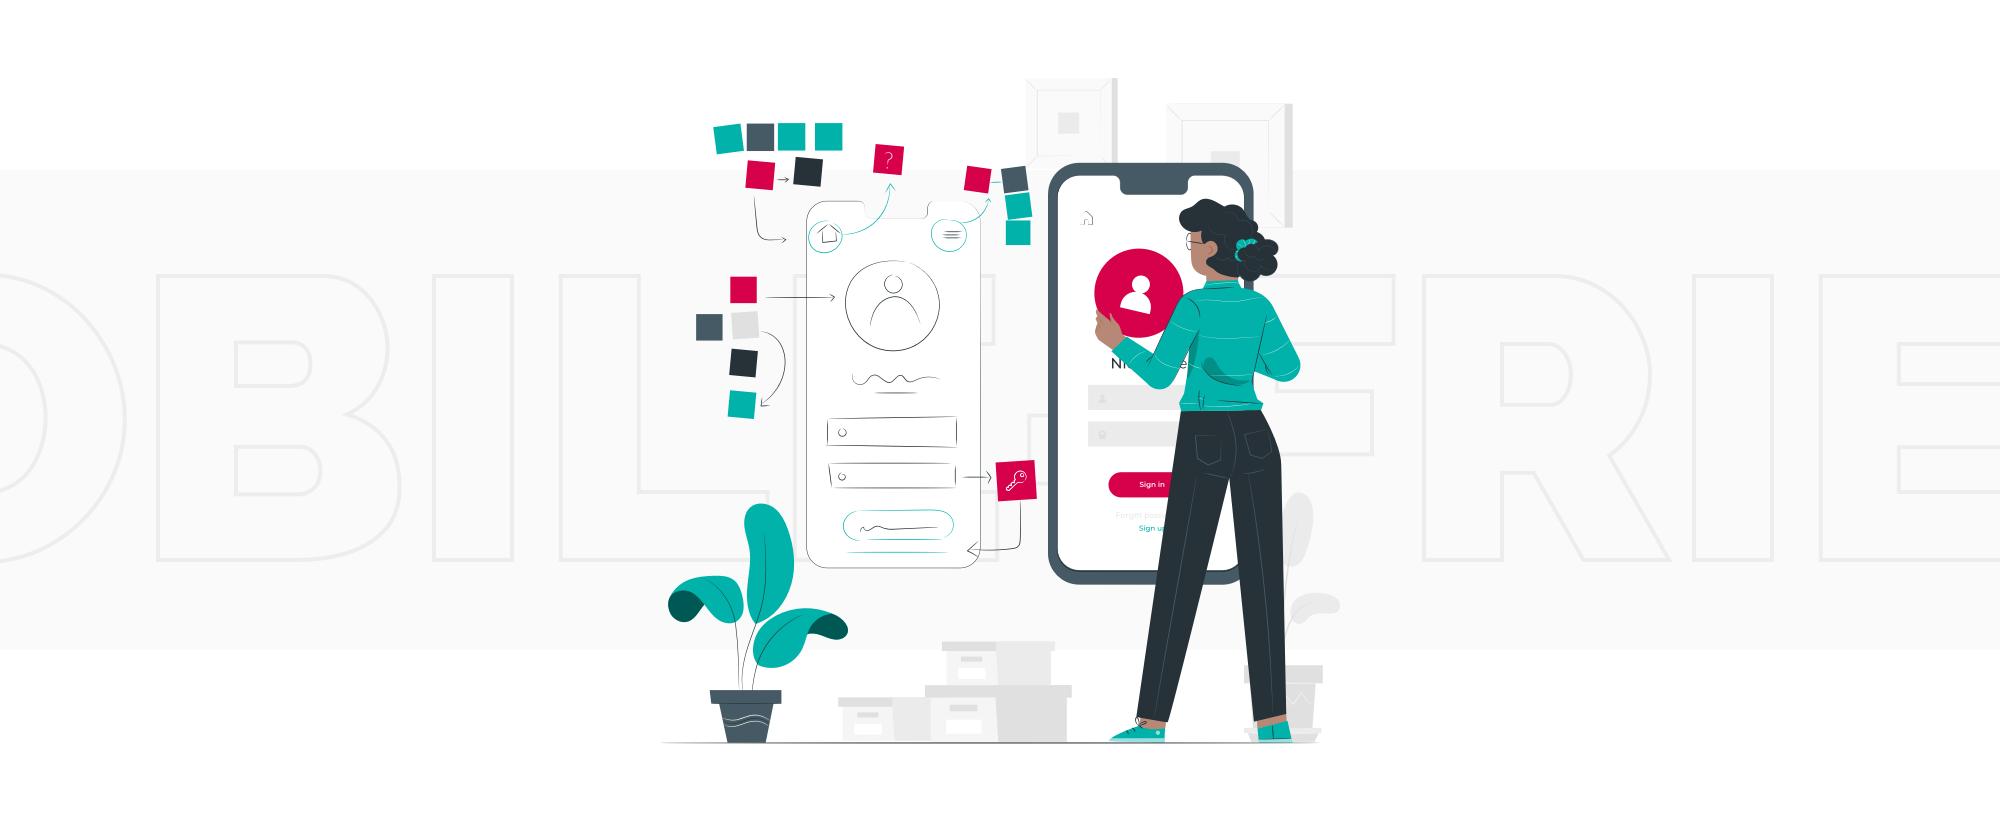 make it mobile frienly in UI/UX